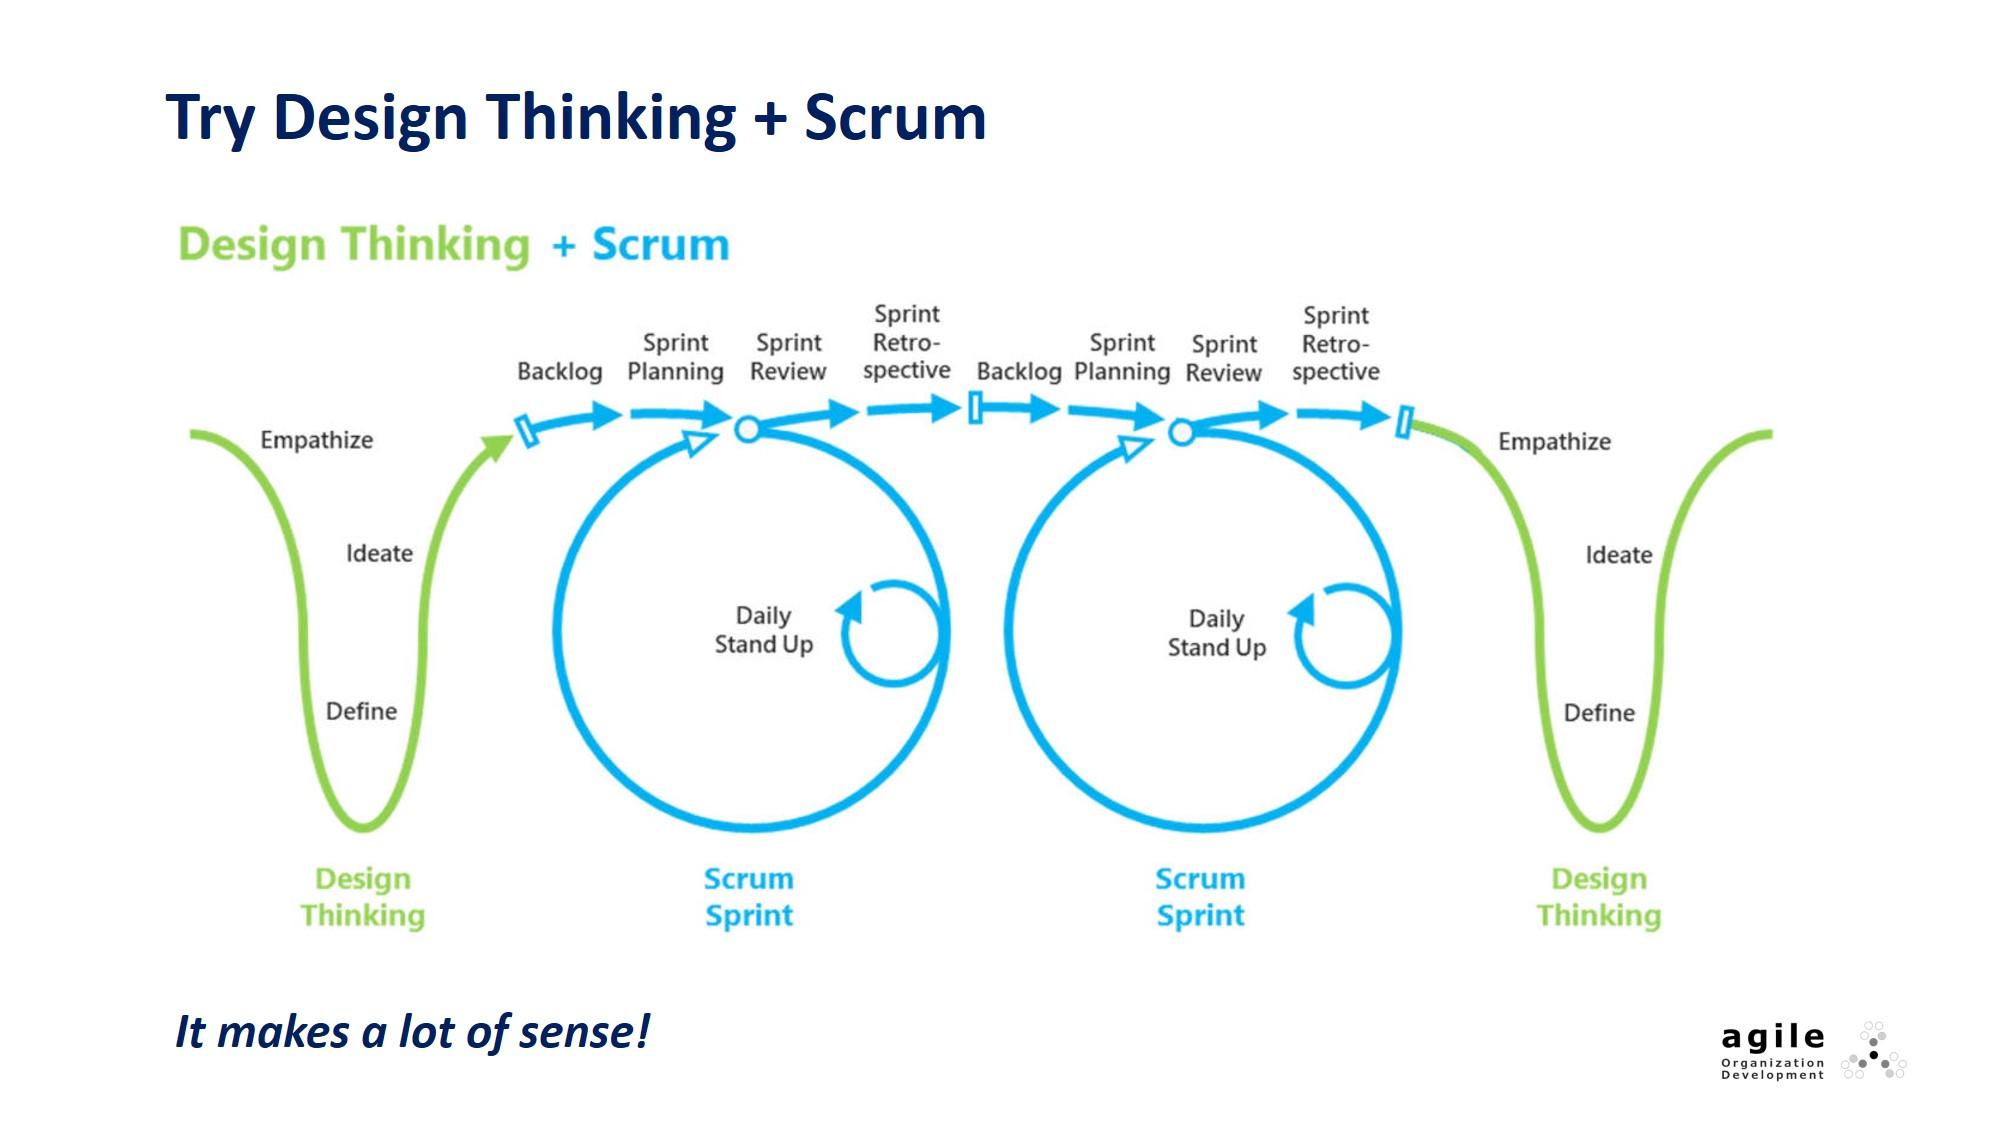 Try Design Thinking + Scrum